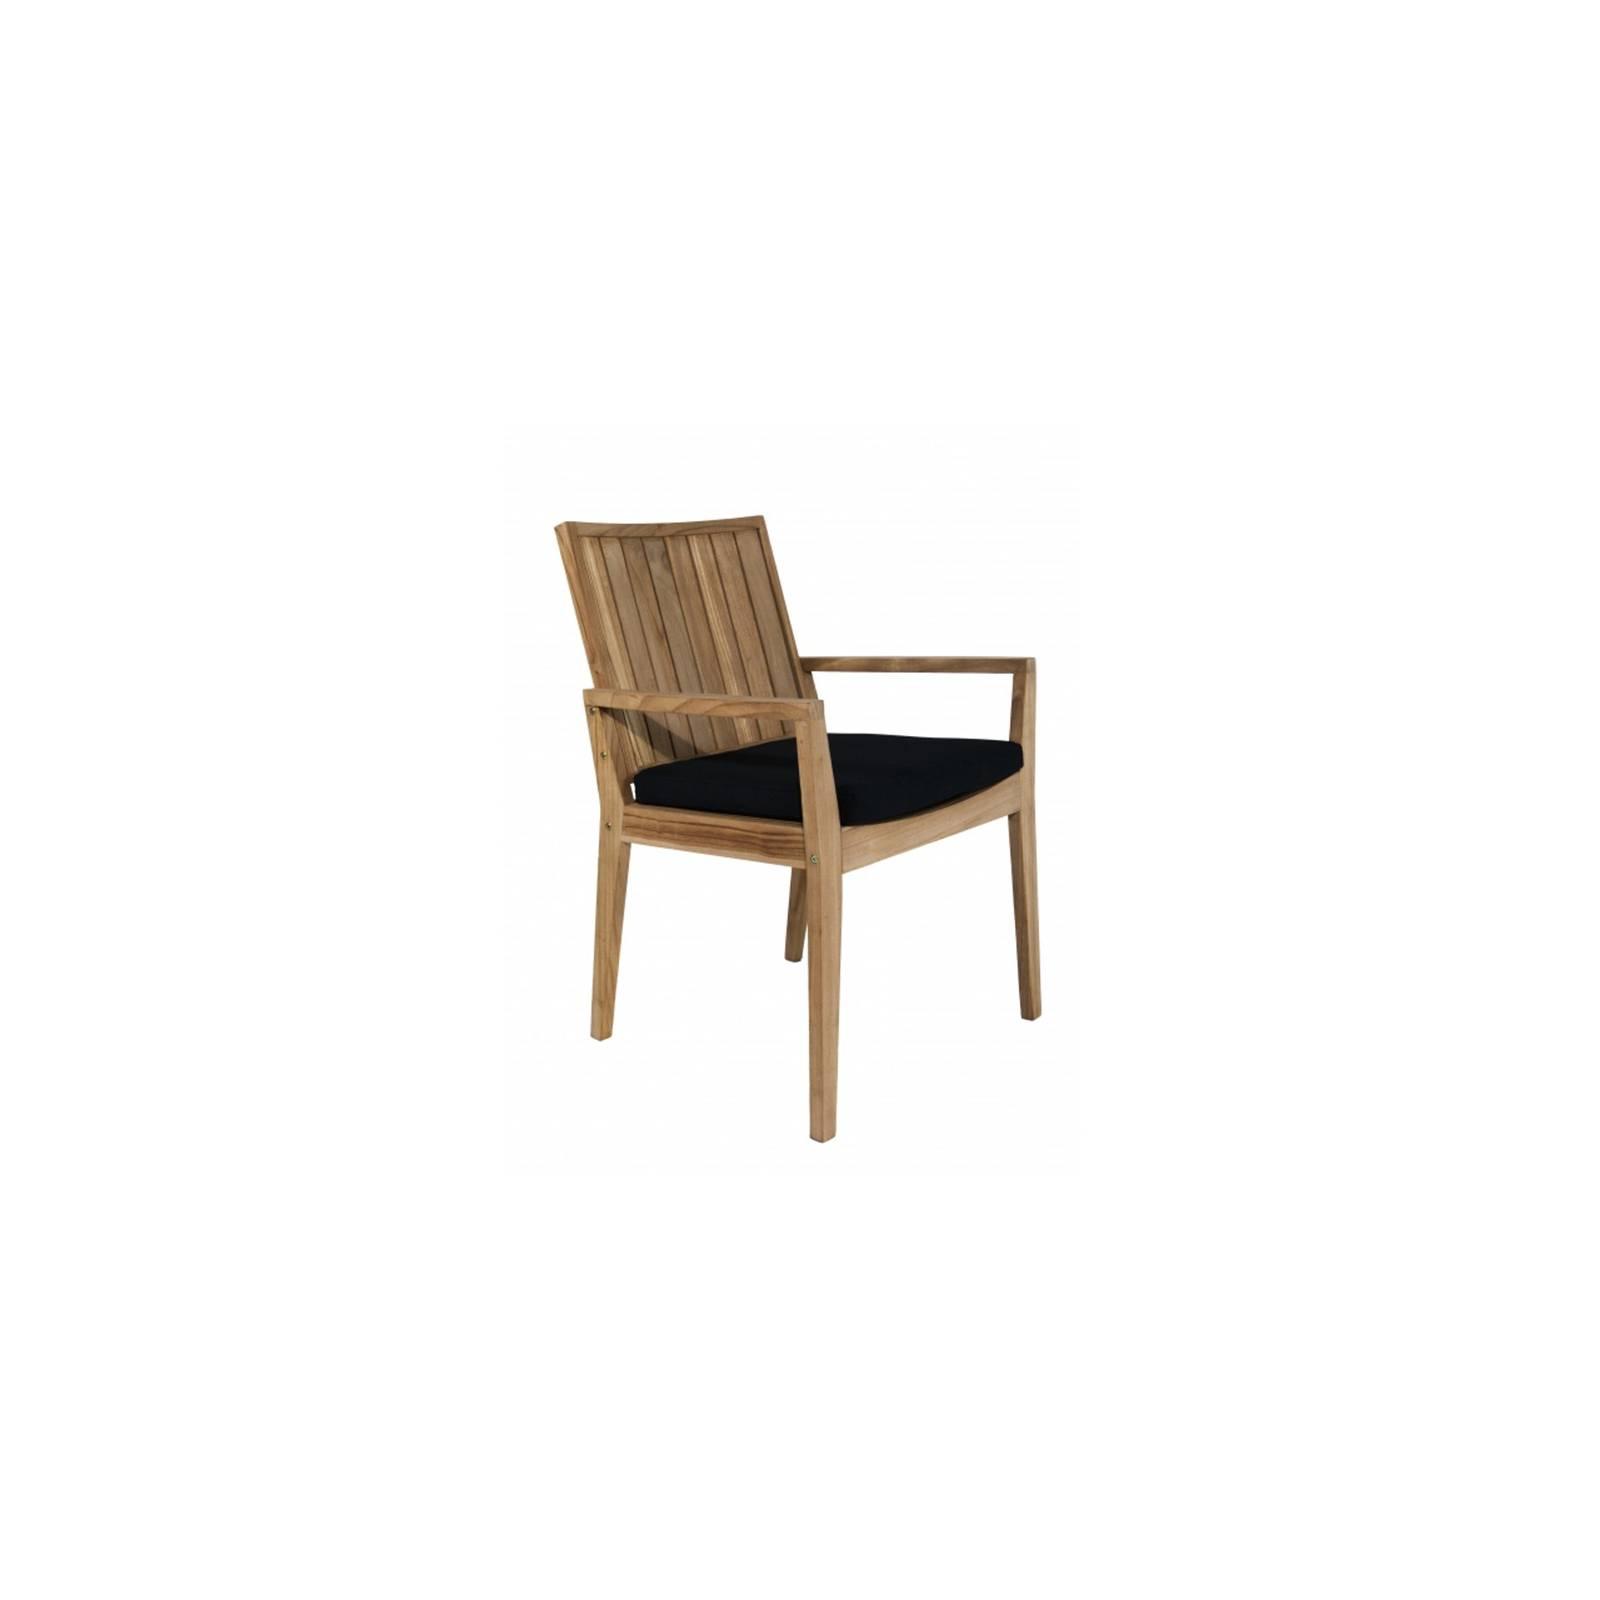 Fauteuil Coussin Taman Teck Recyclé - meuble de jardin